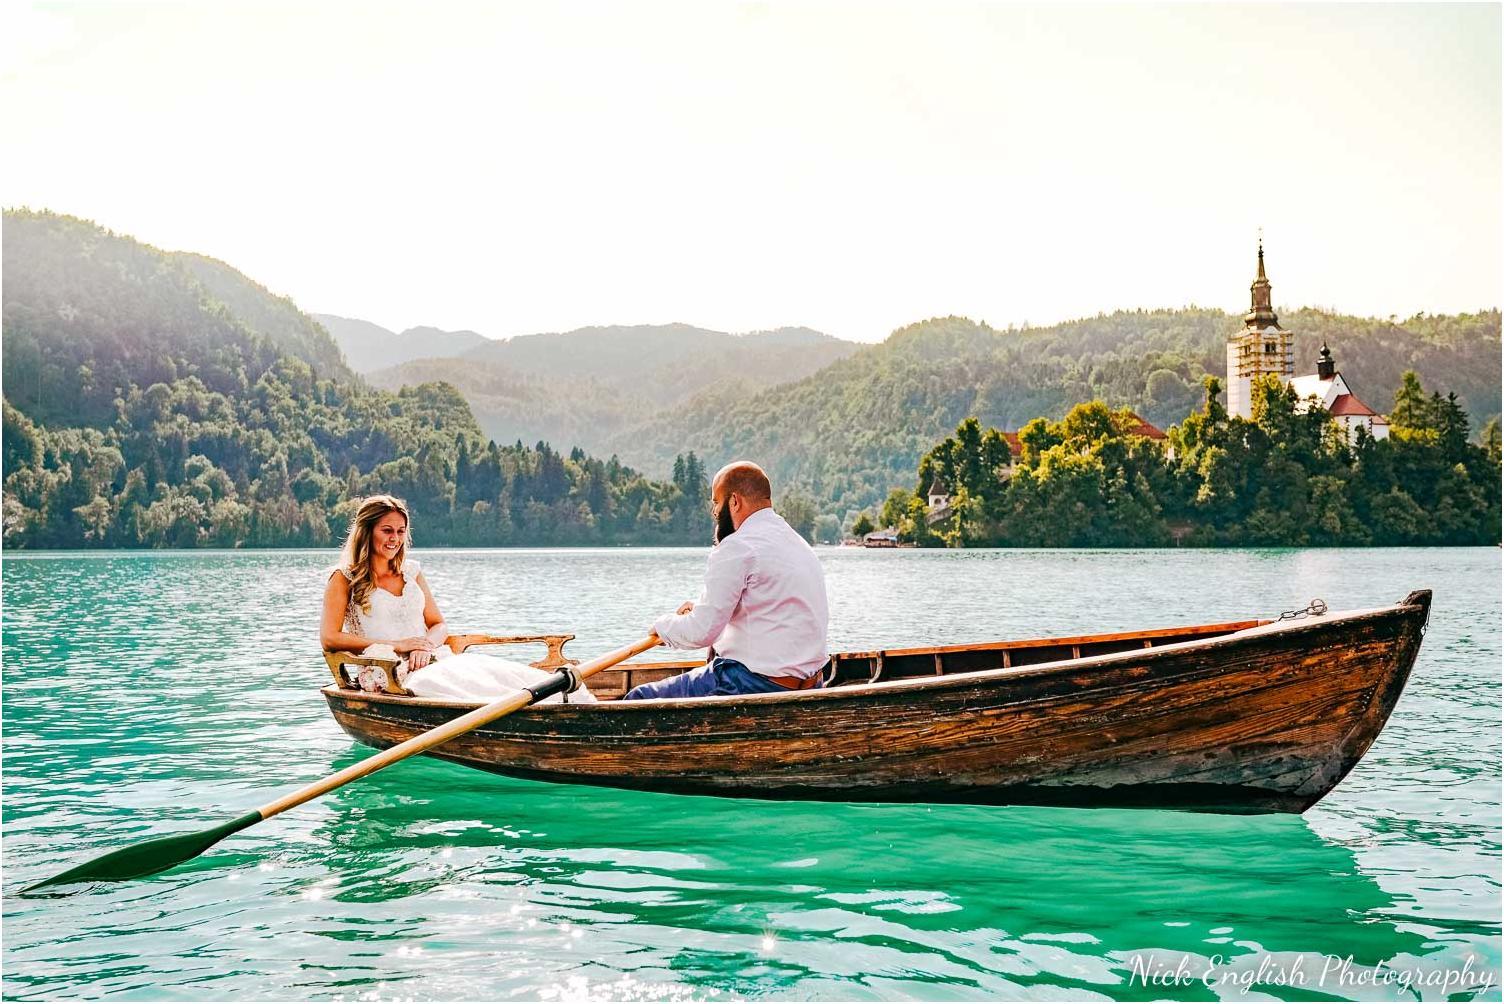 Destination_Wedding_Photographer_Slovenia_Nick_English_Photography-70-2.jpg